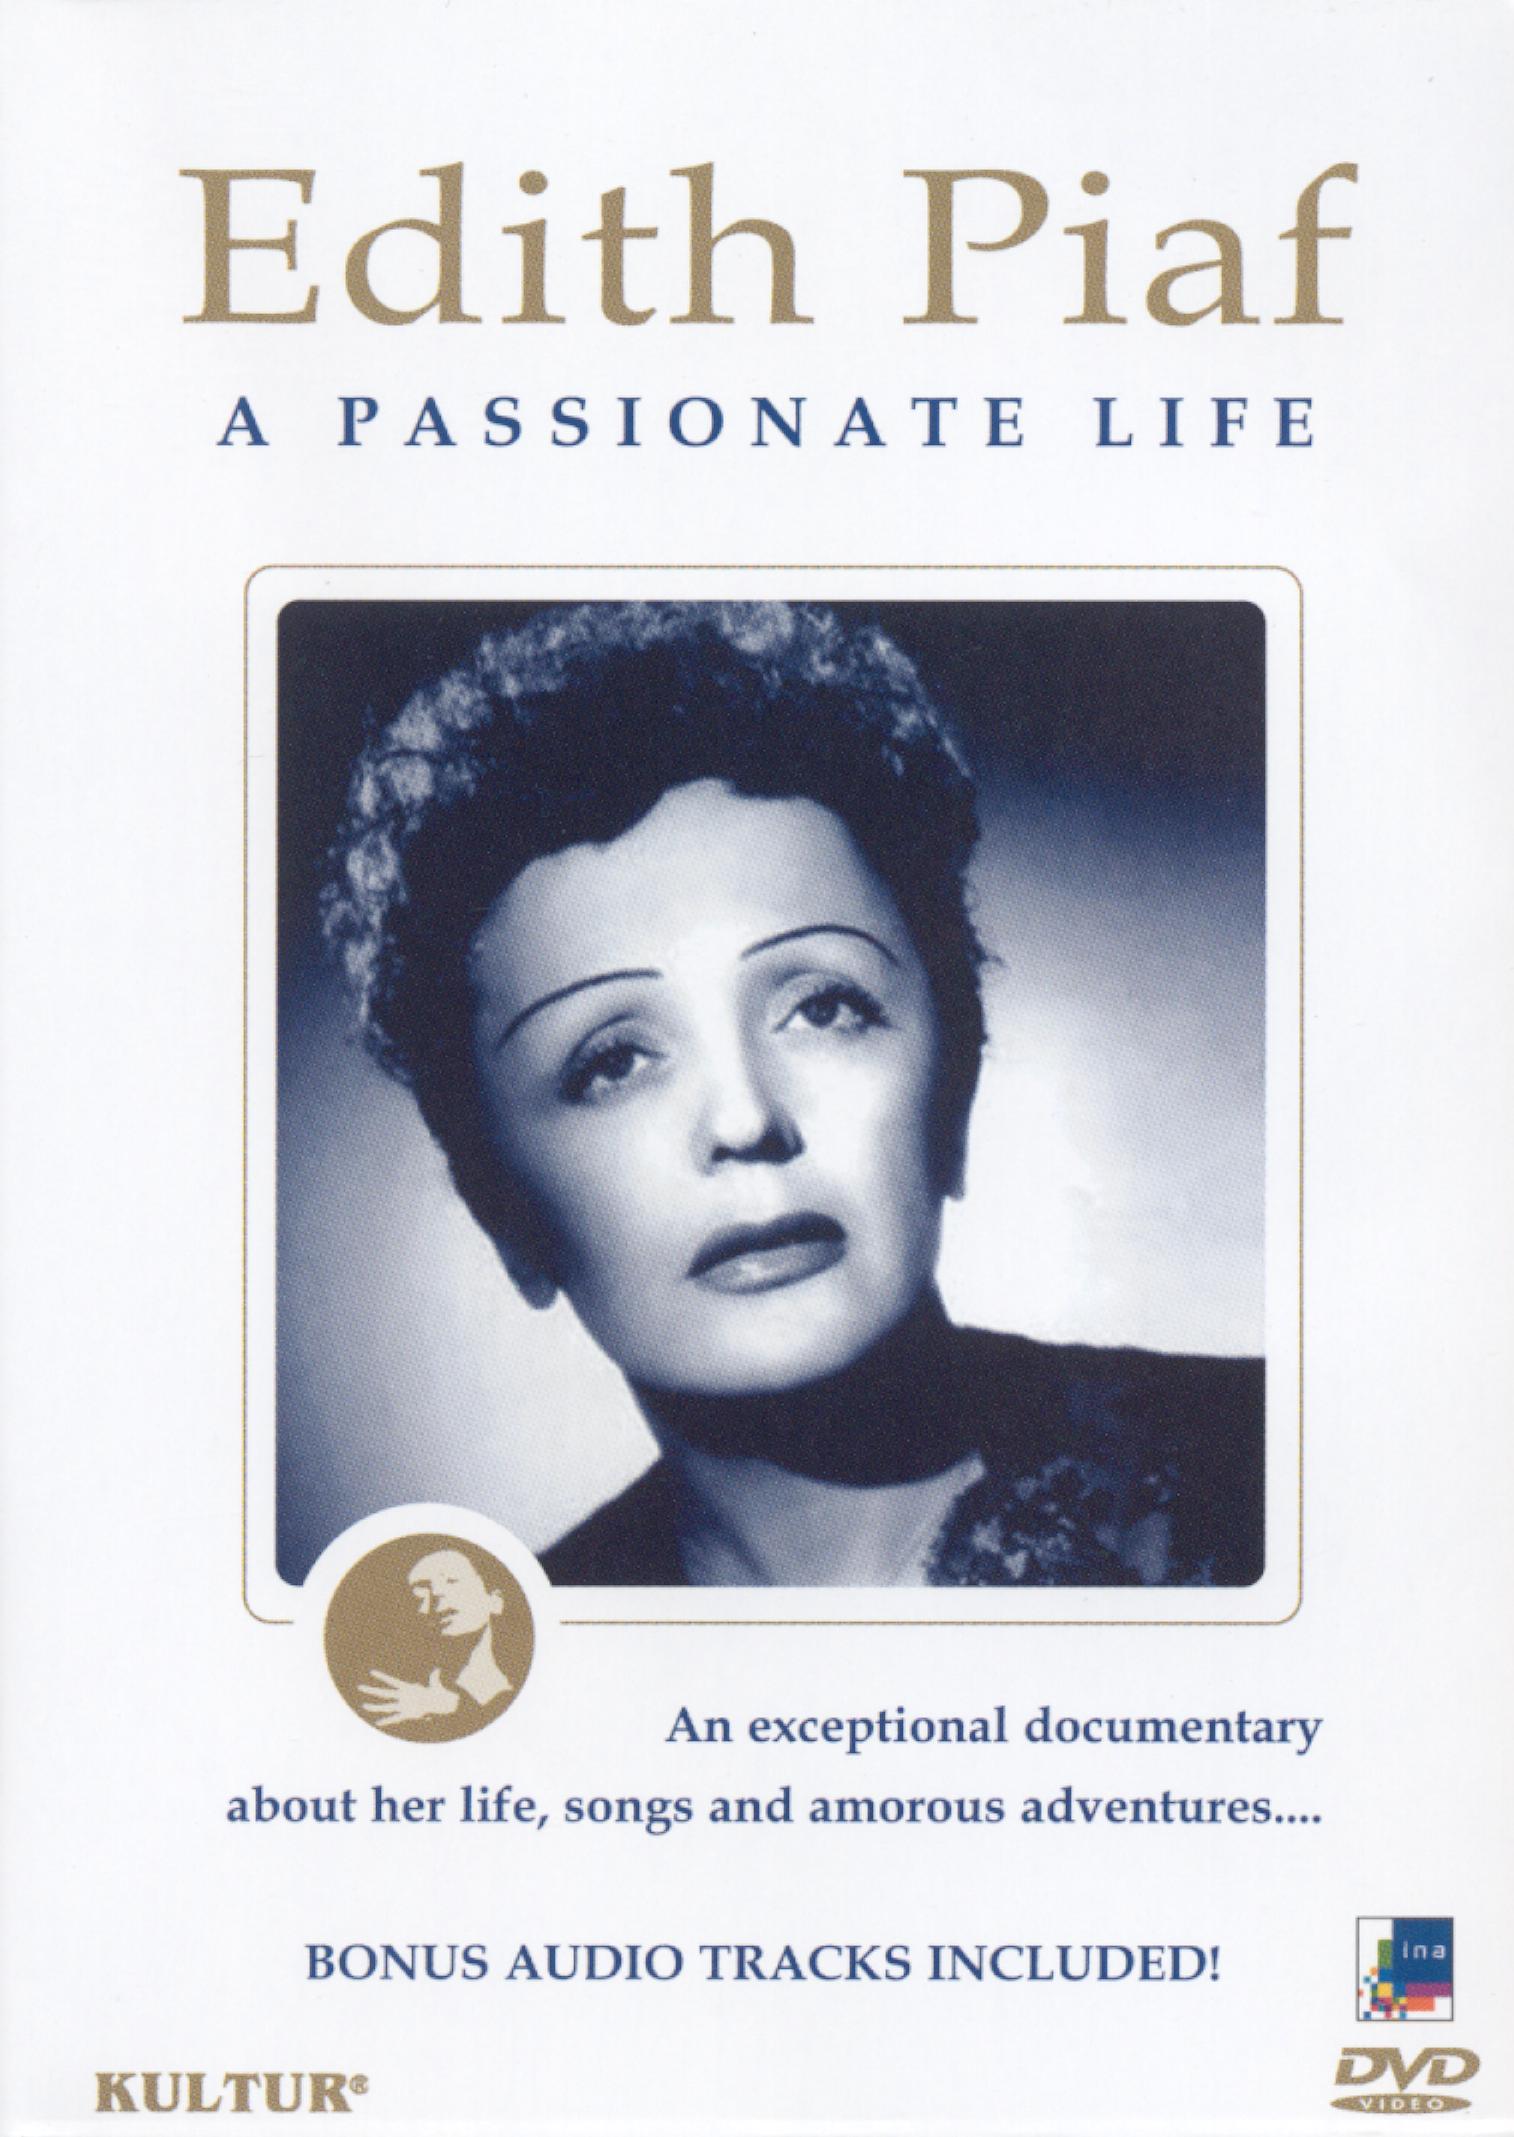 Edith Piaf: A Passionate Life